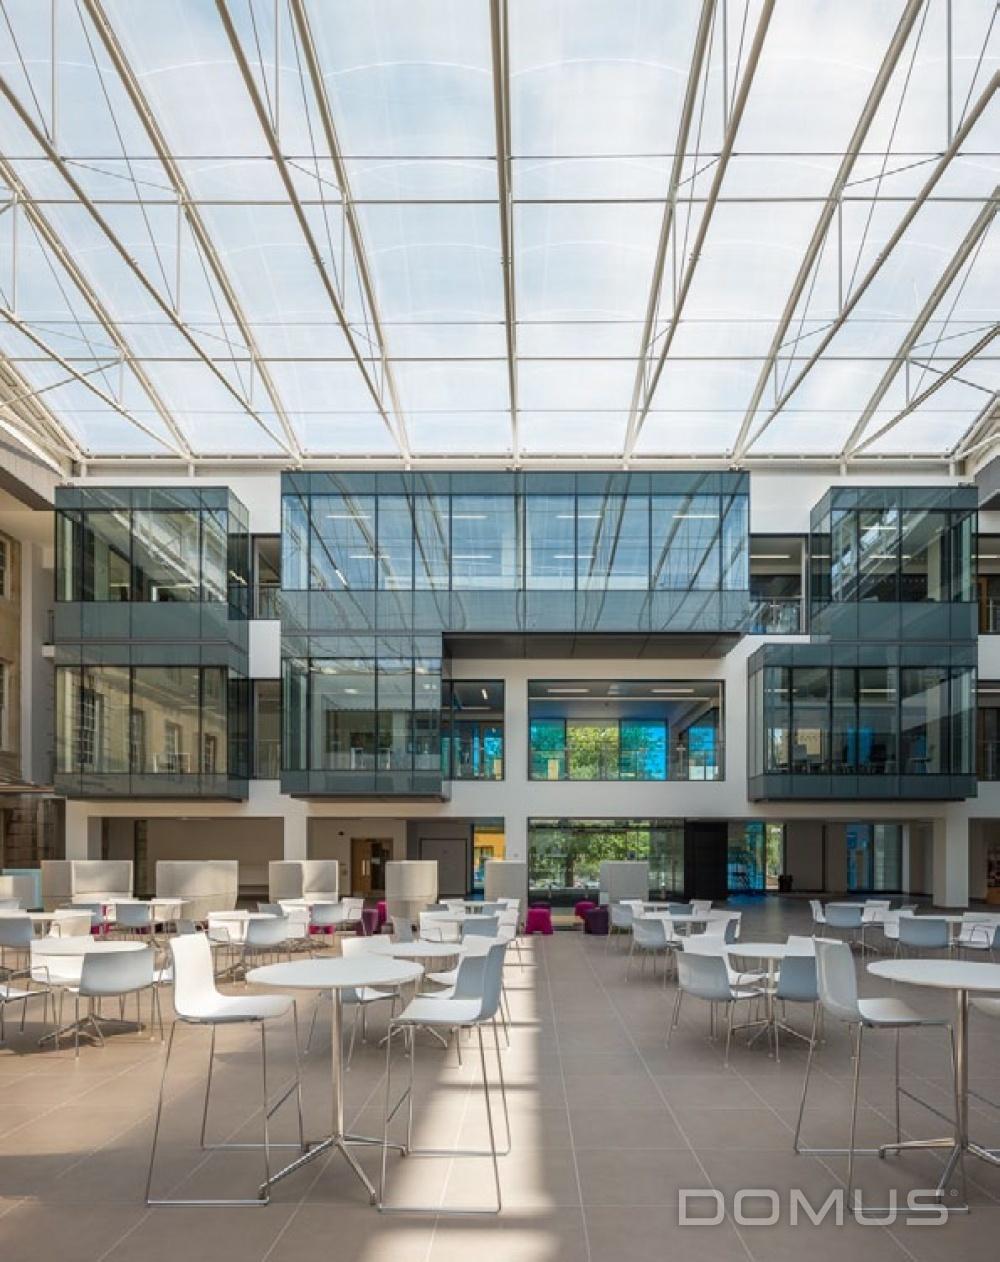 Trowbridge County Hall Case Study Domus Tiles The UK